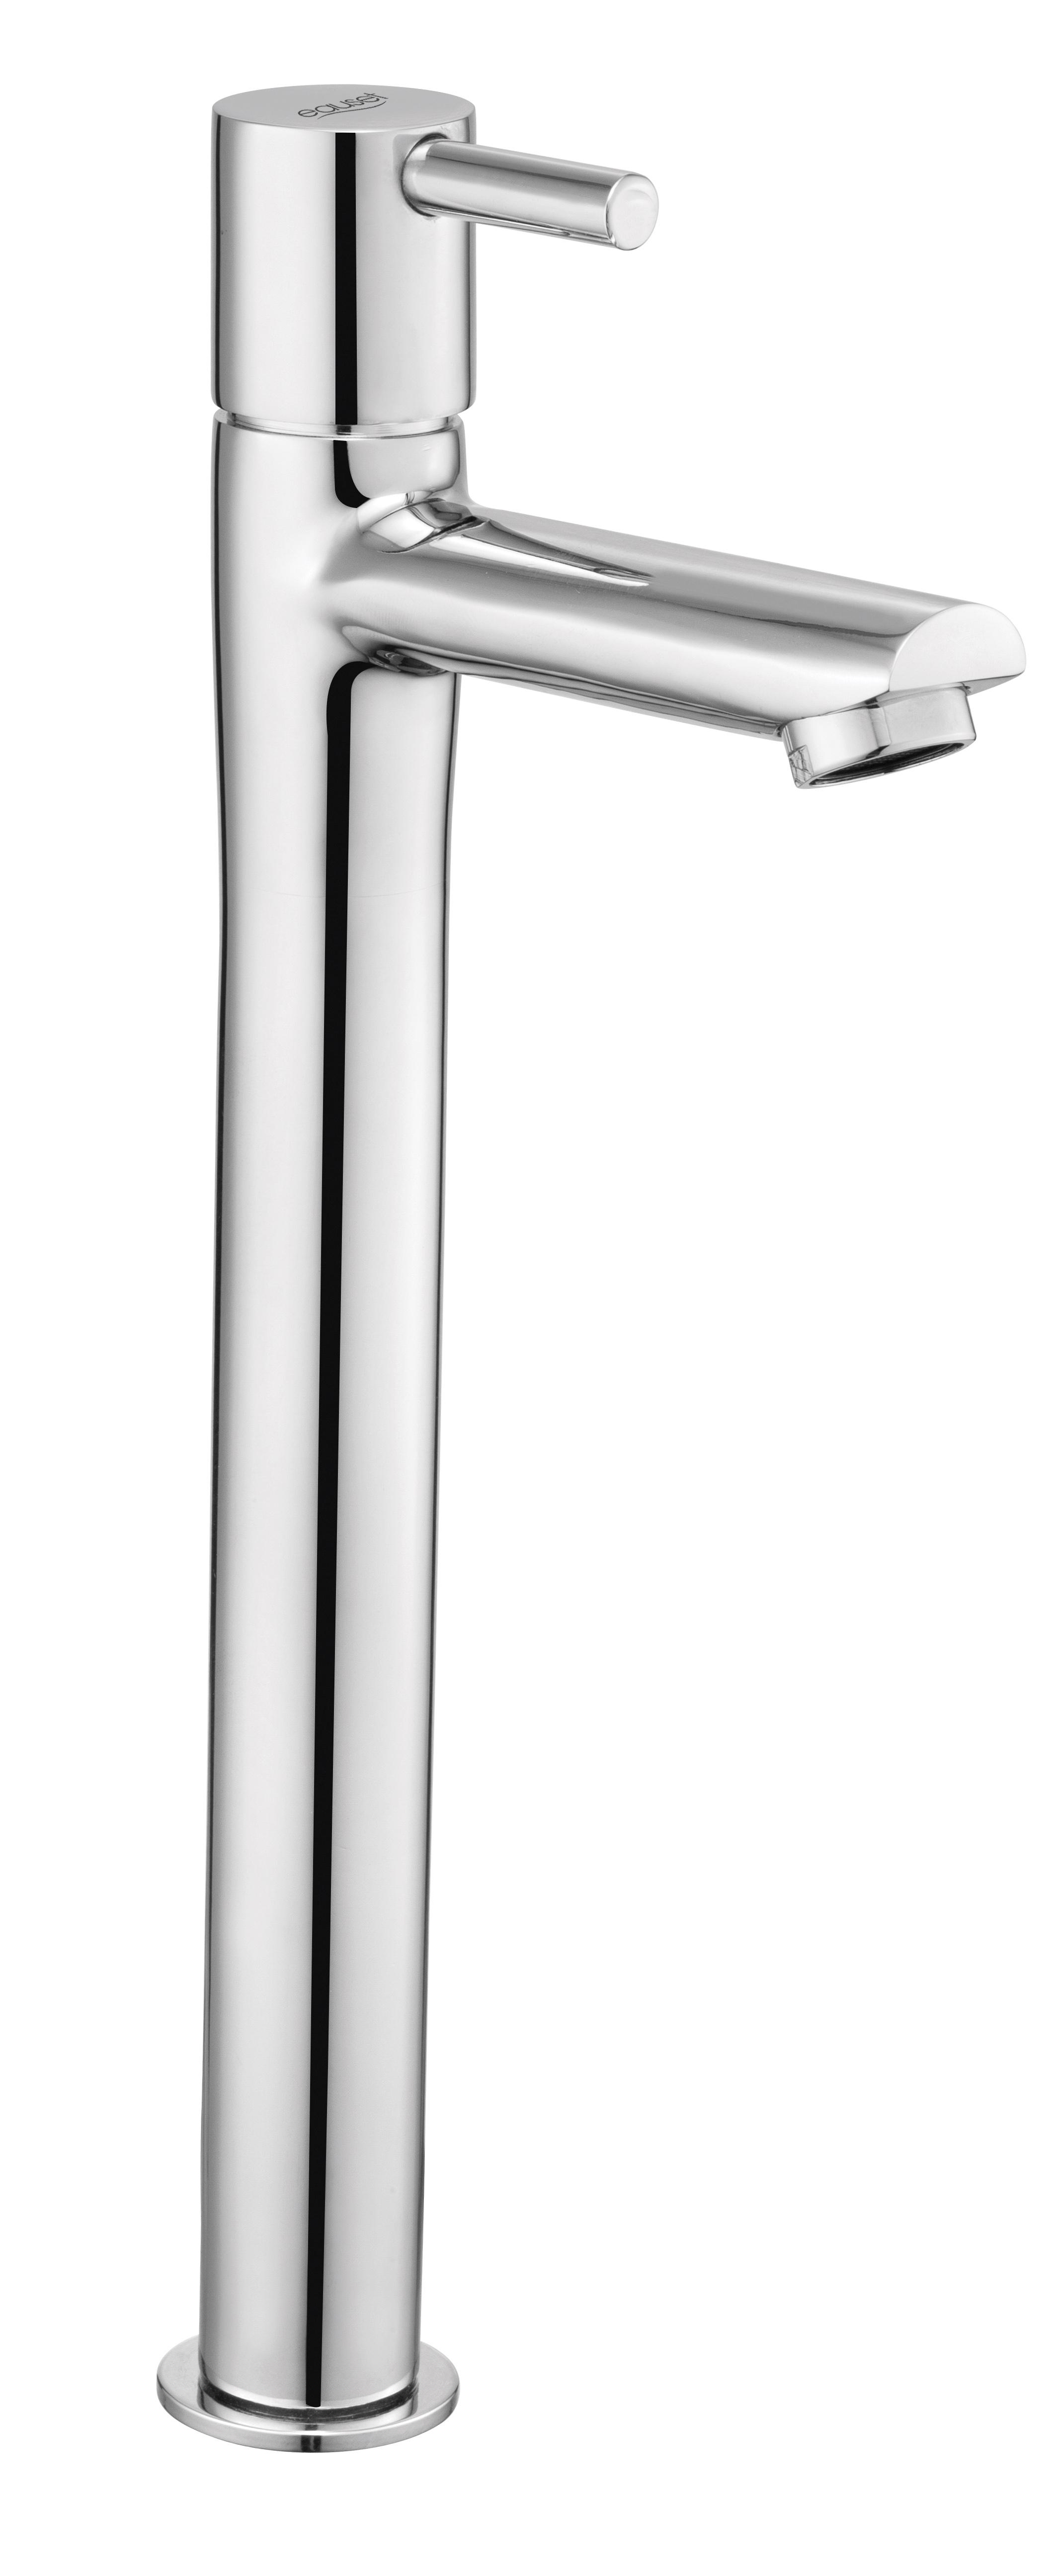 Tall Boy Pillar Cock